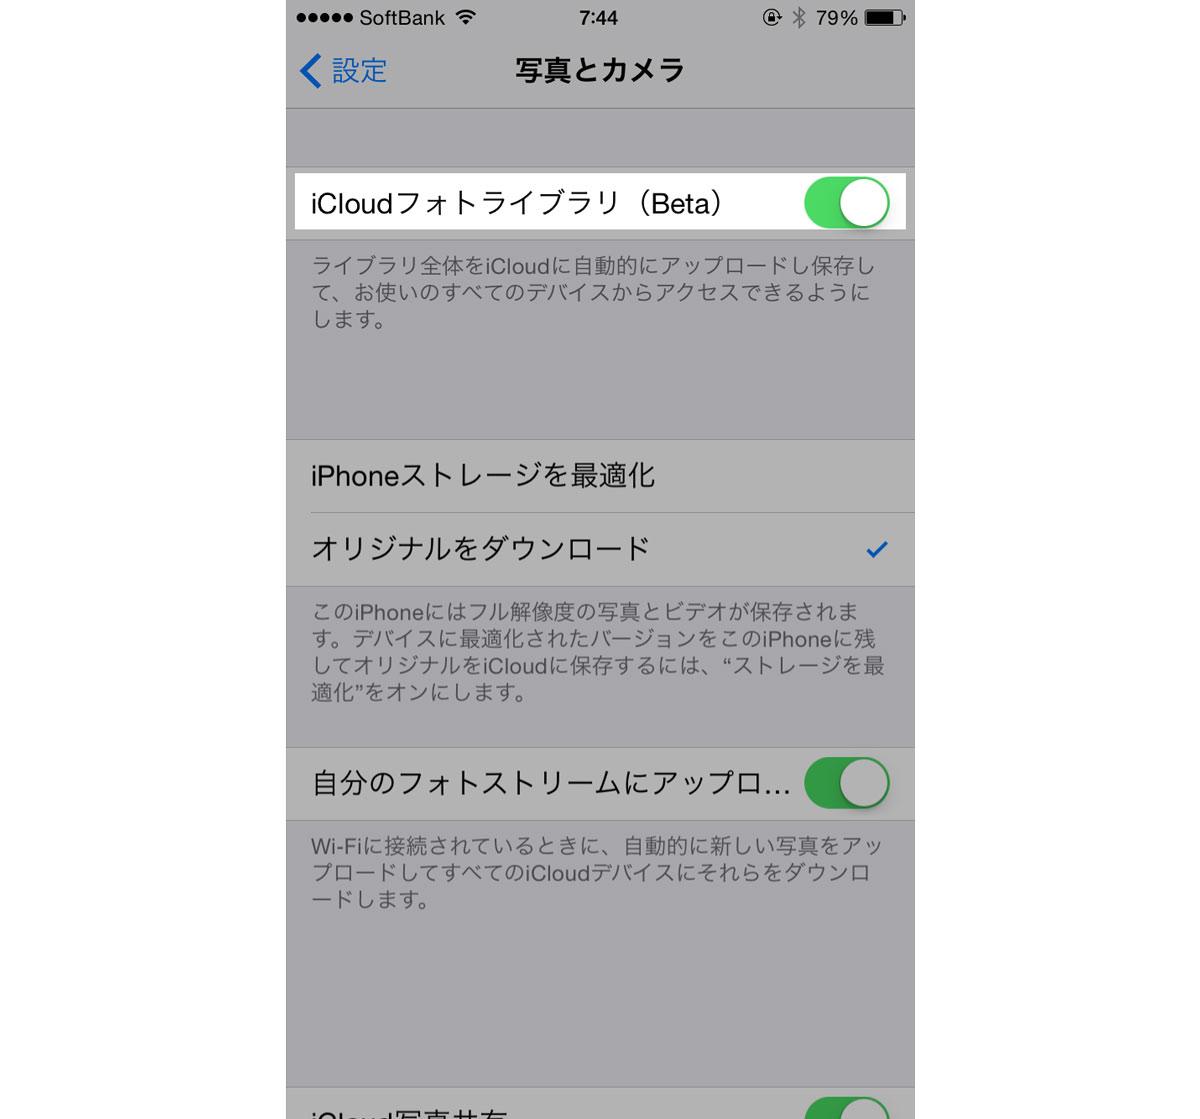 iCloudフォトライブラリ iOS